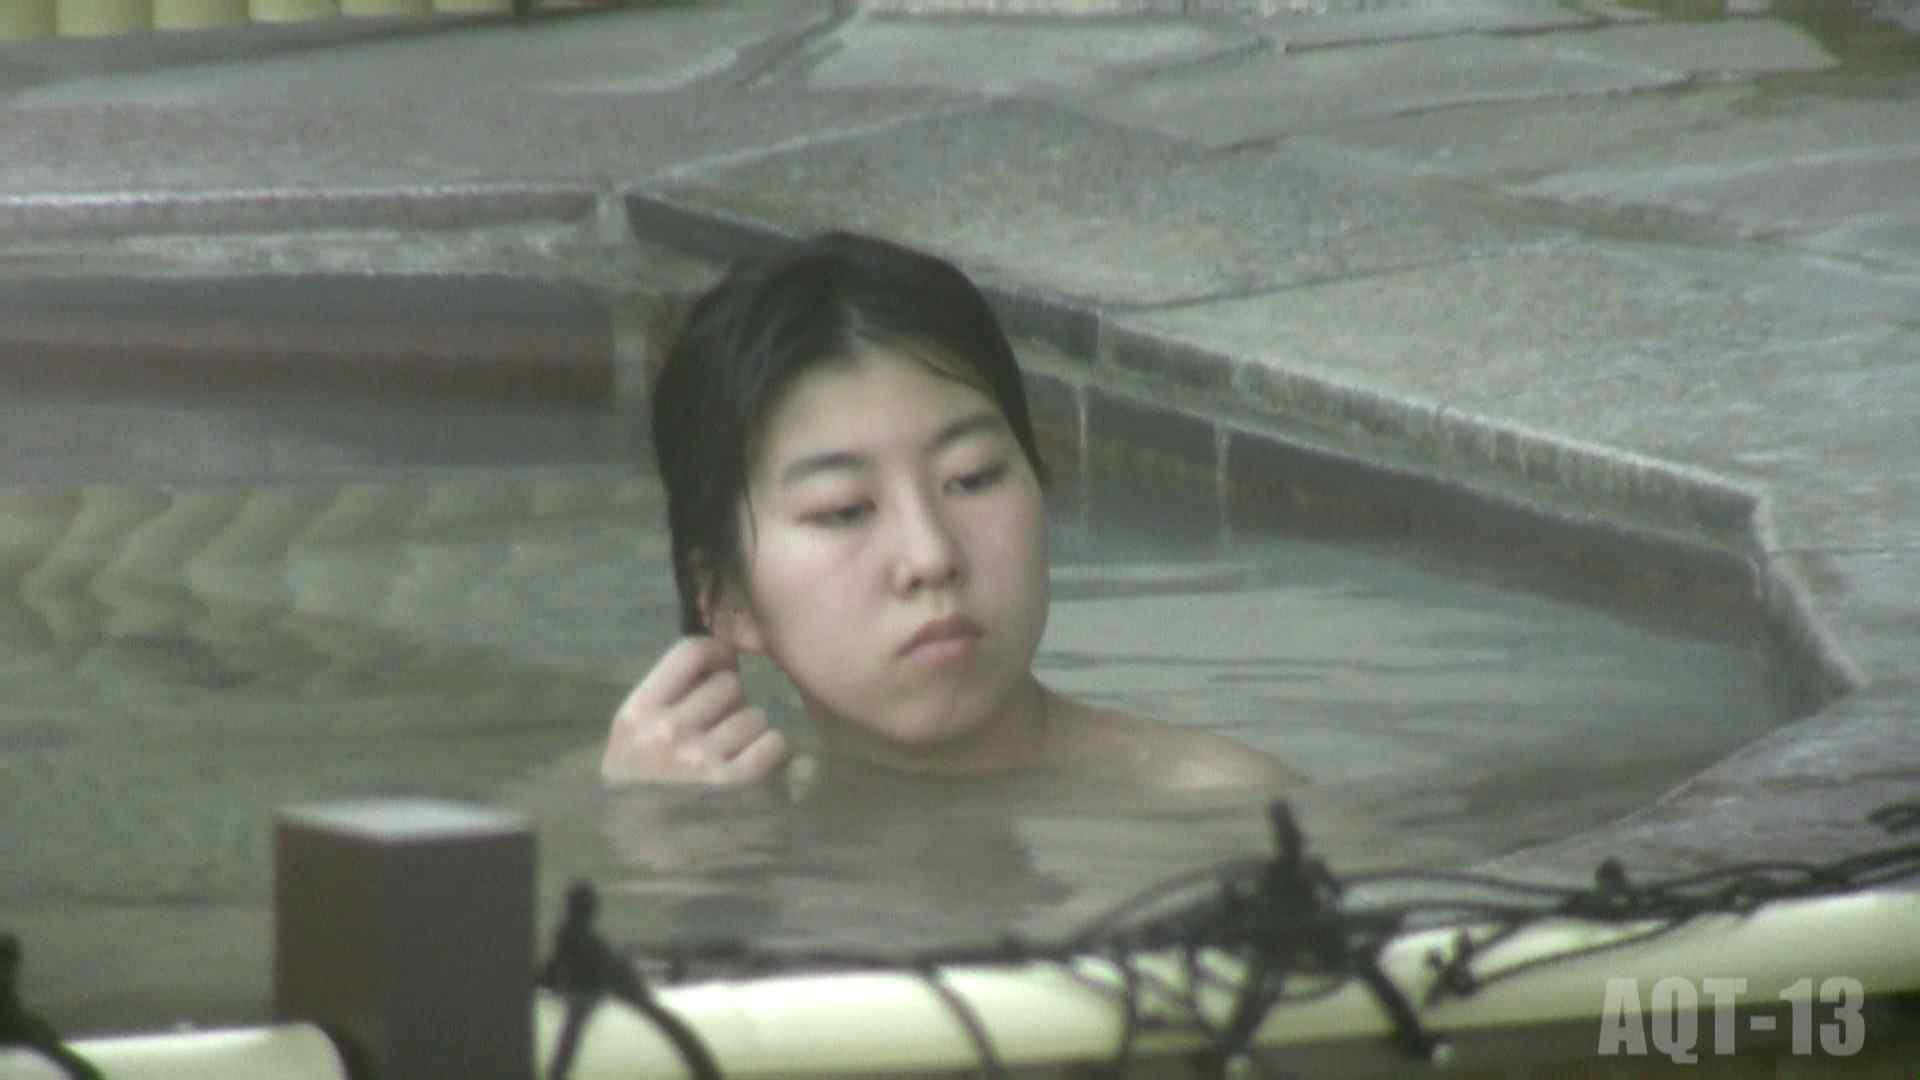 Aquaな露天風呂Vol.816 露天 AV動画キャプチャ 105PICs 32